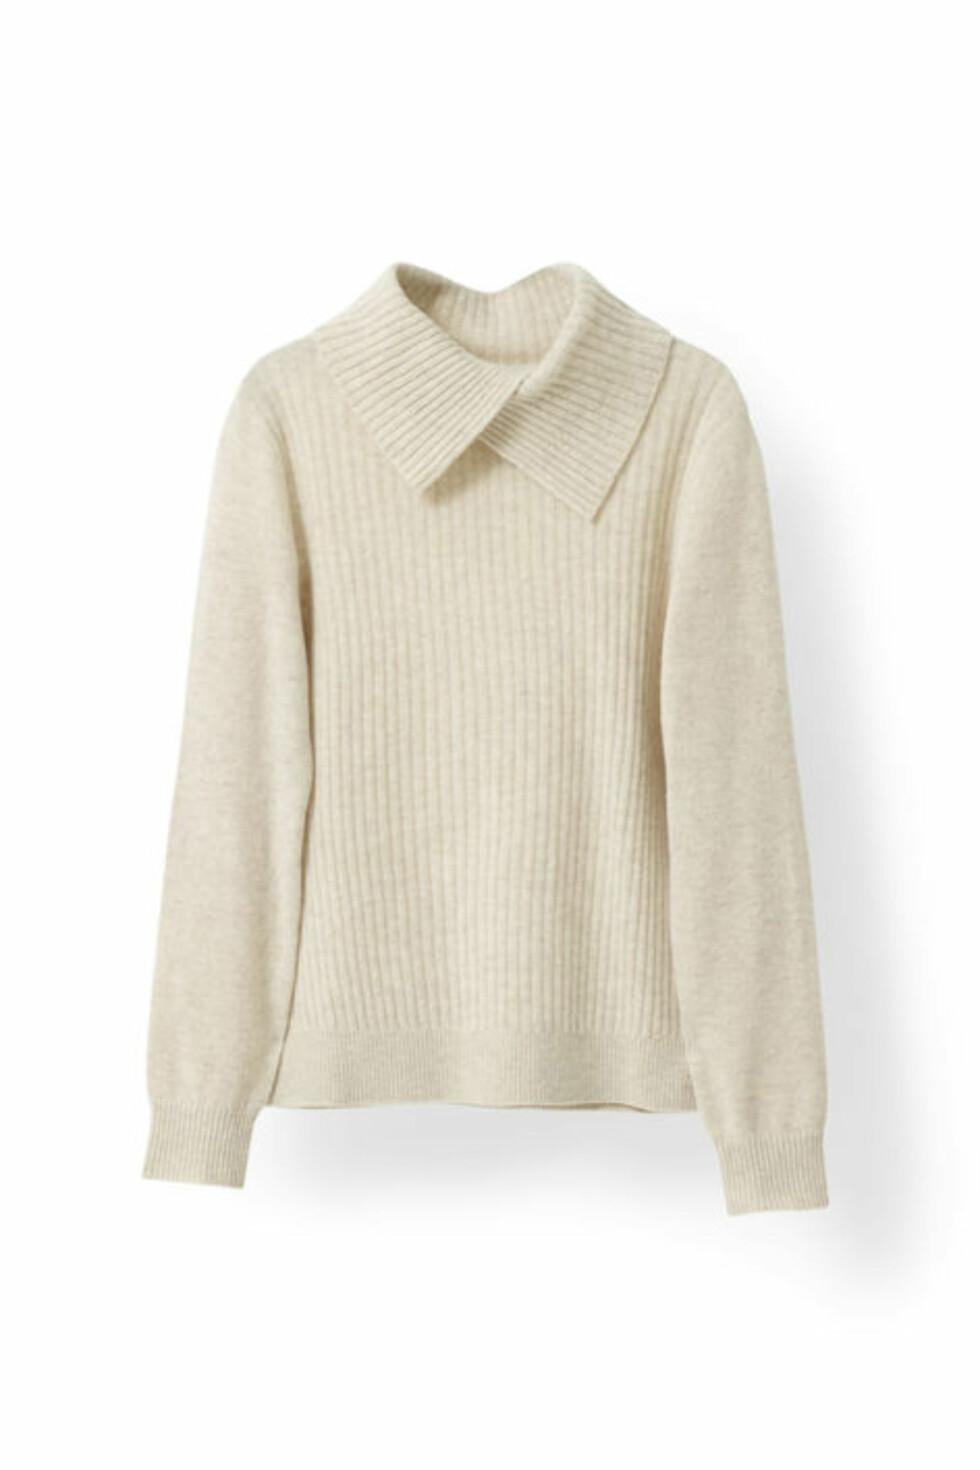 Strikkagenser fra Ganni   kr 1599   http://www.ganni.com/shop/shirts-and-blouses/mercer-knit-rollneck/K0914.html?dwvar_K0914_color=Vanilla%20Ice%20Melange#start=43